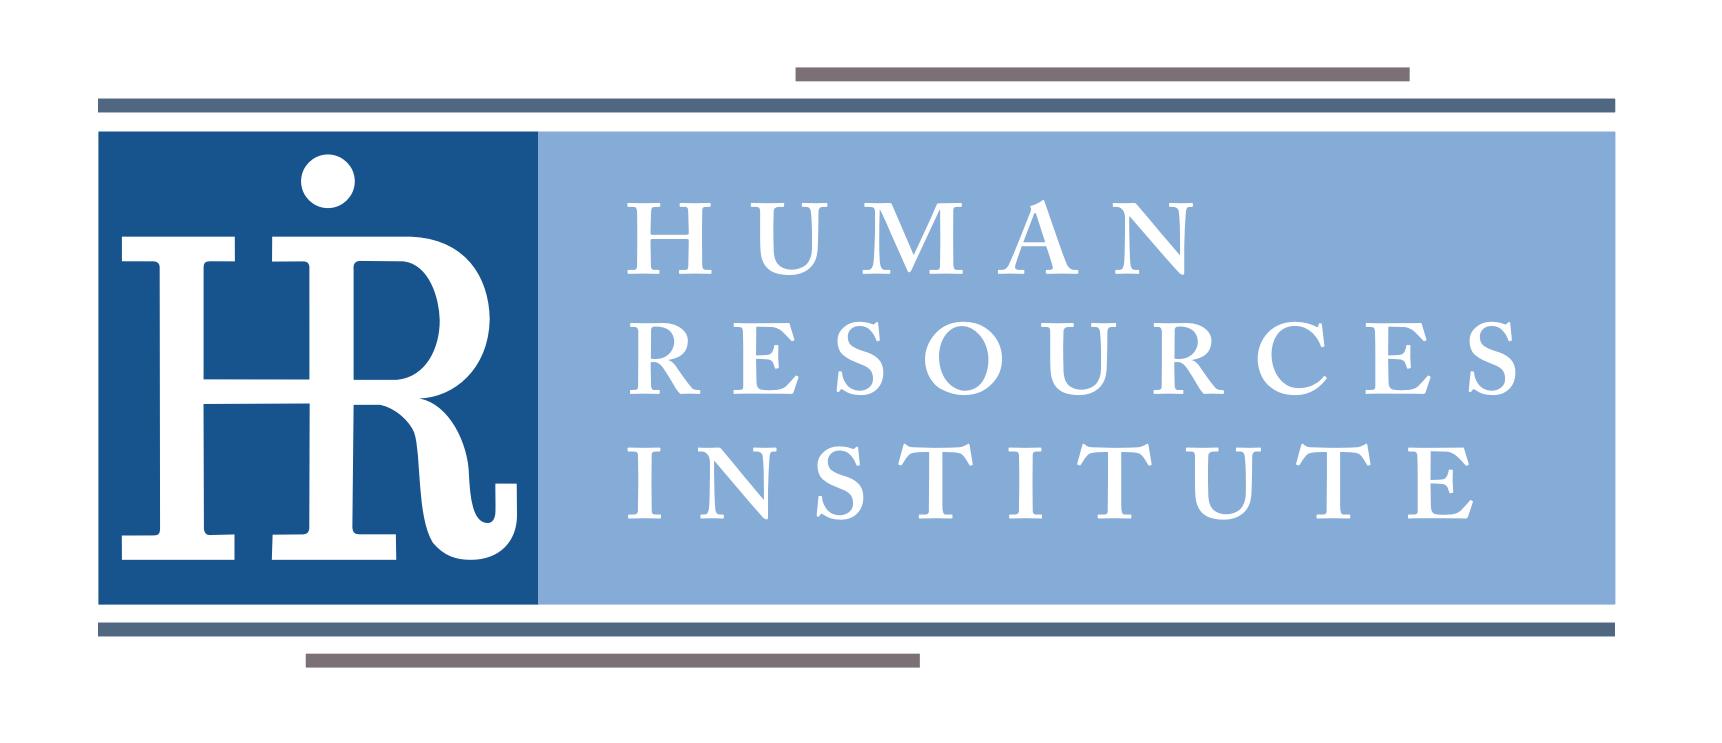 Институт за човешки ресурси